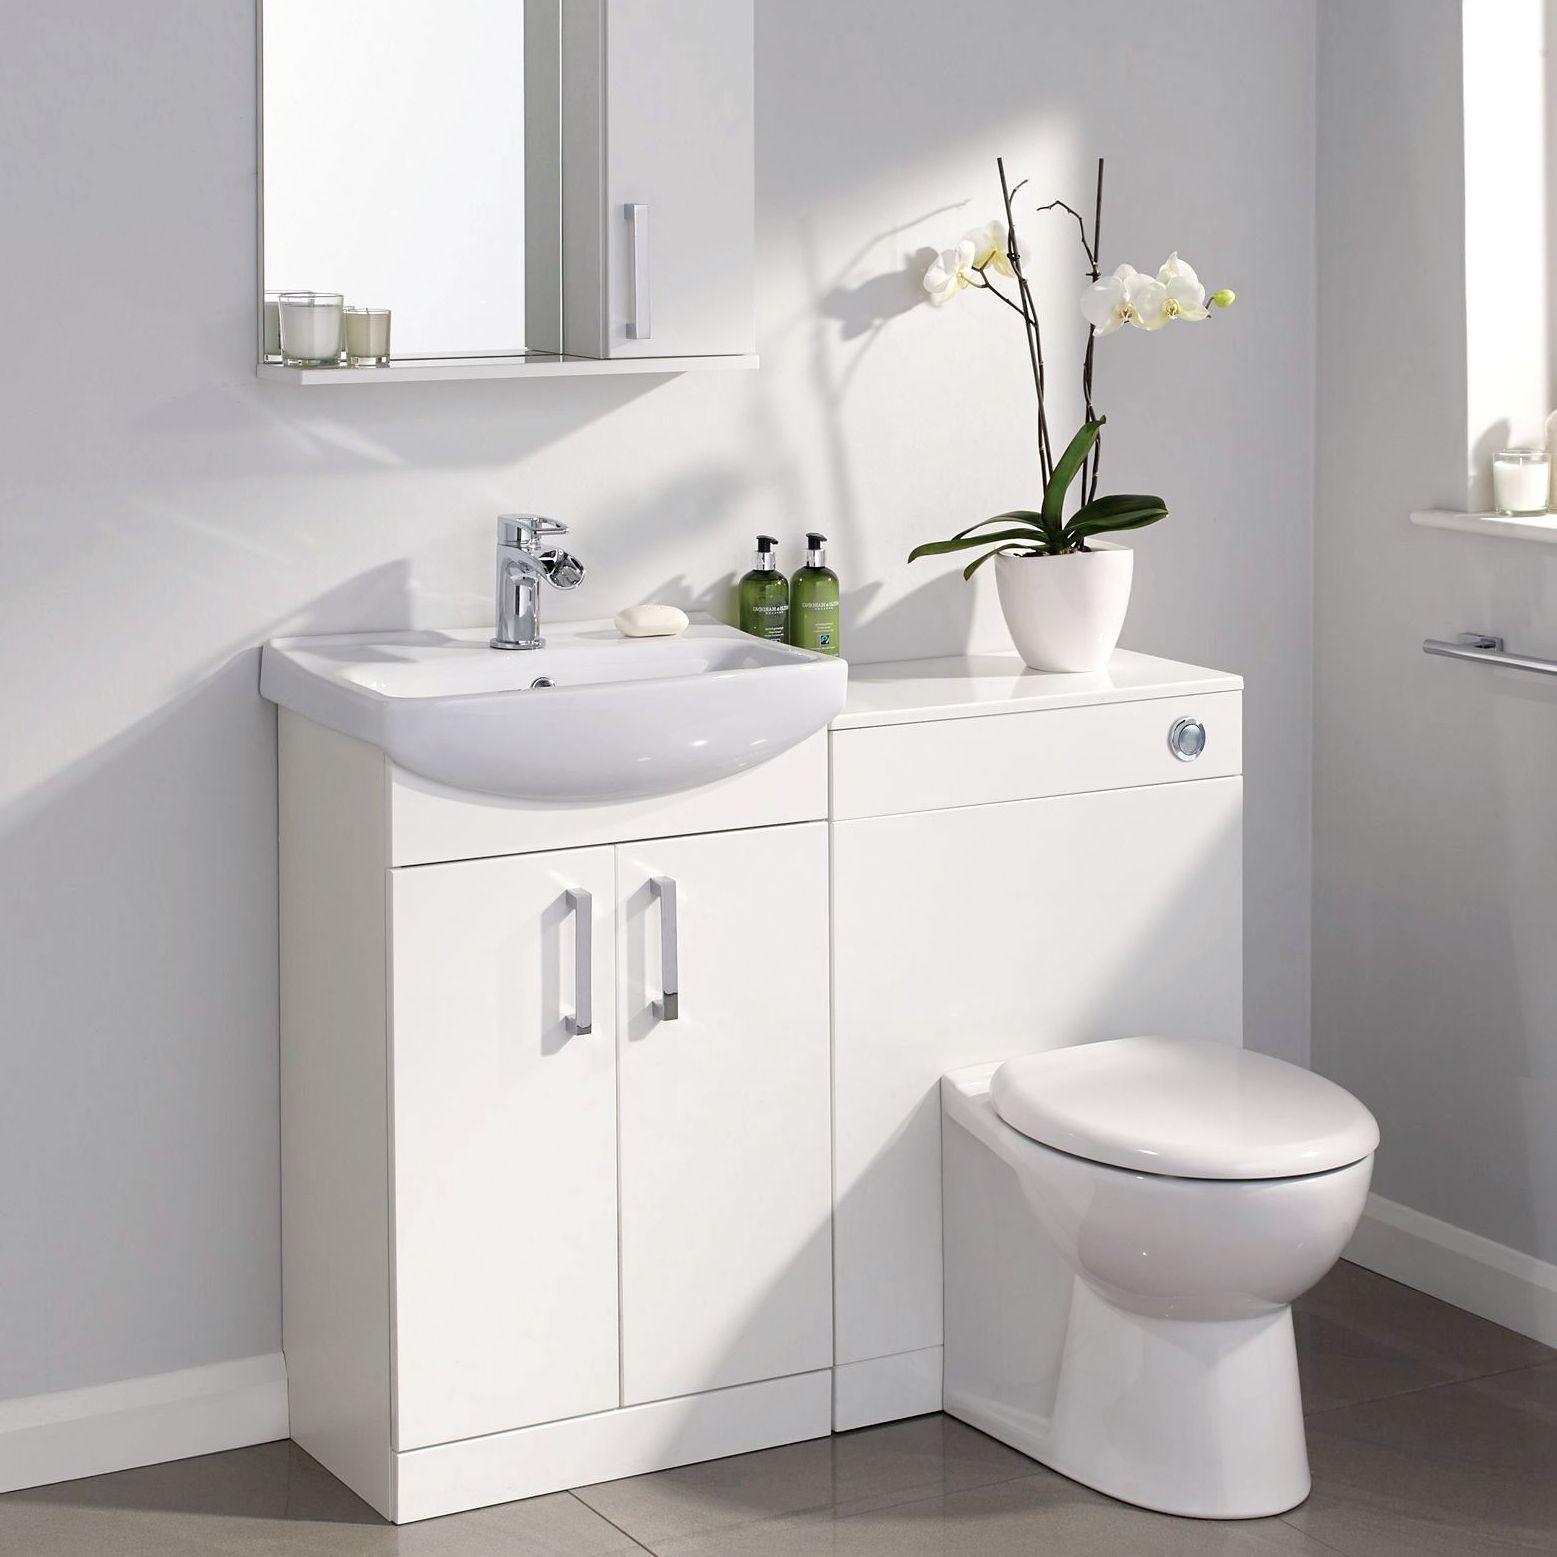 Bathroom Sink And Vanity Unit Bq